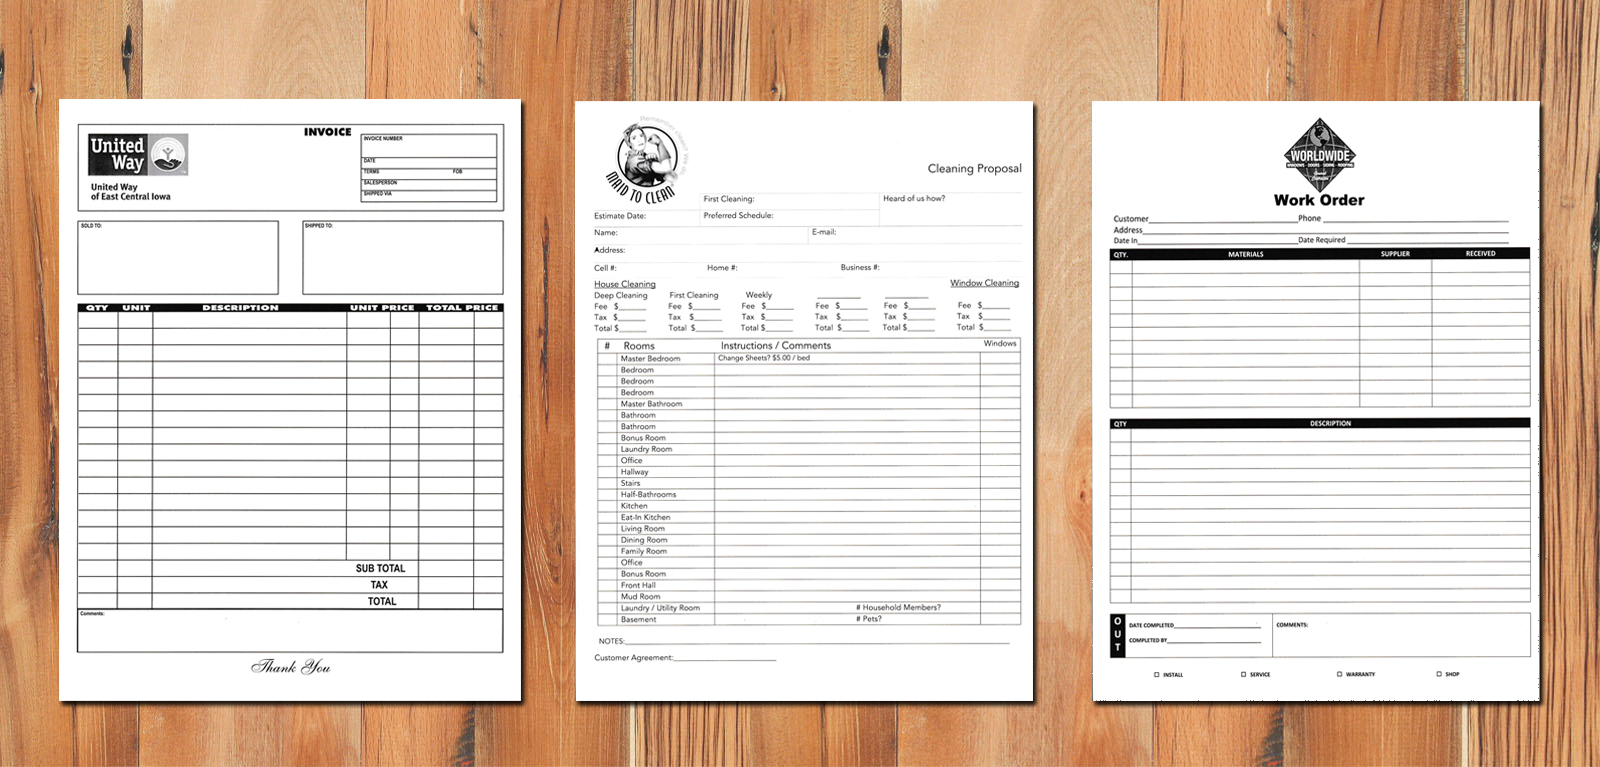 Custom Carbonless Forms Carbonlesscom - Custom carbonless invoice book